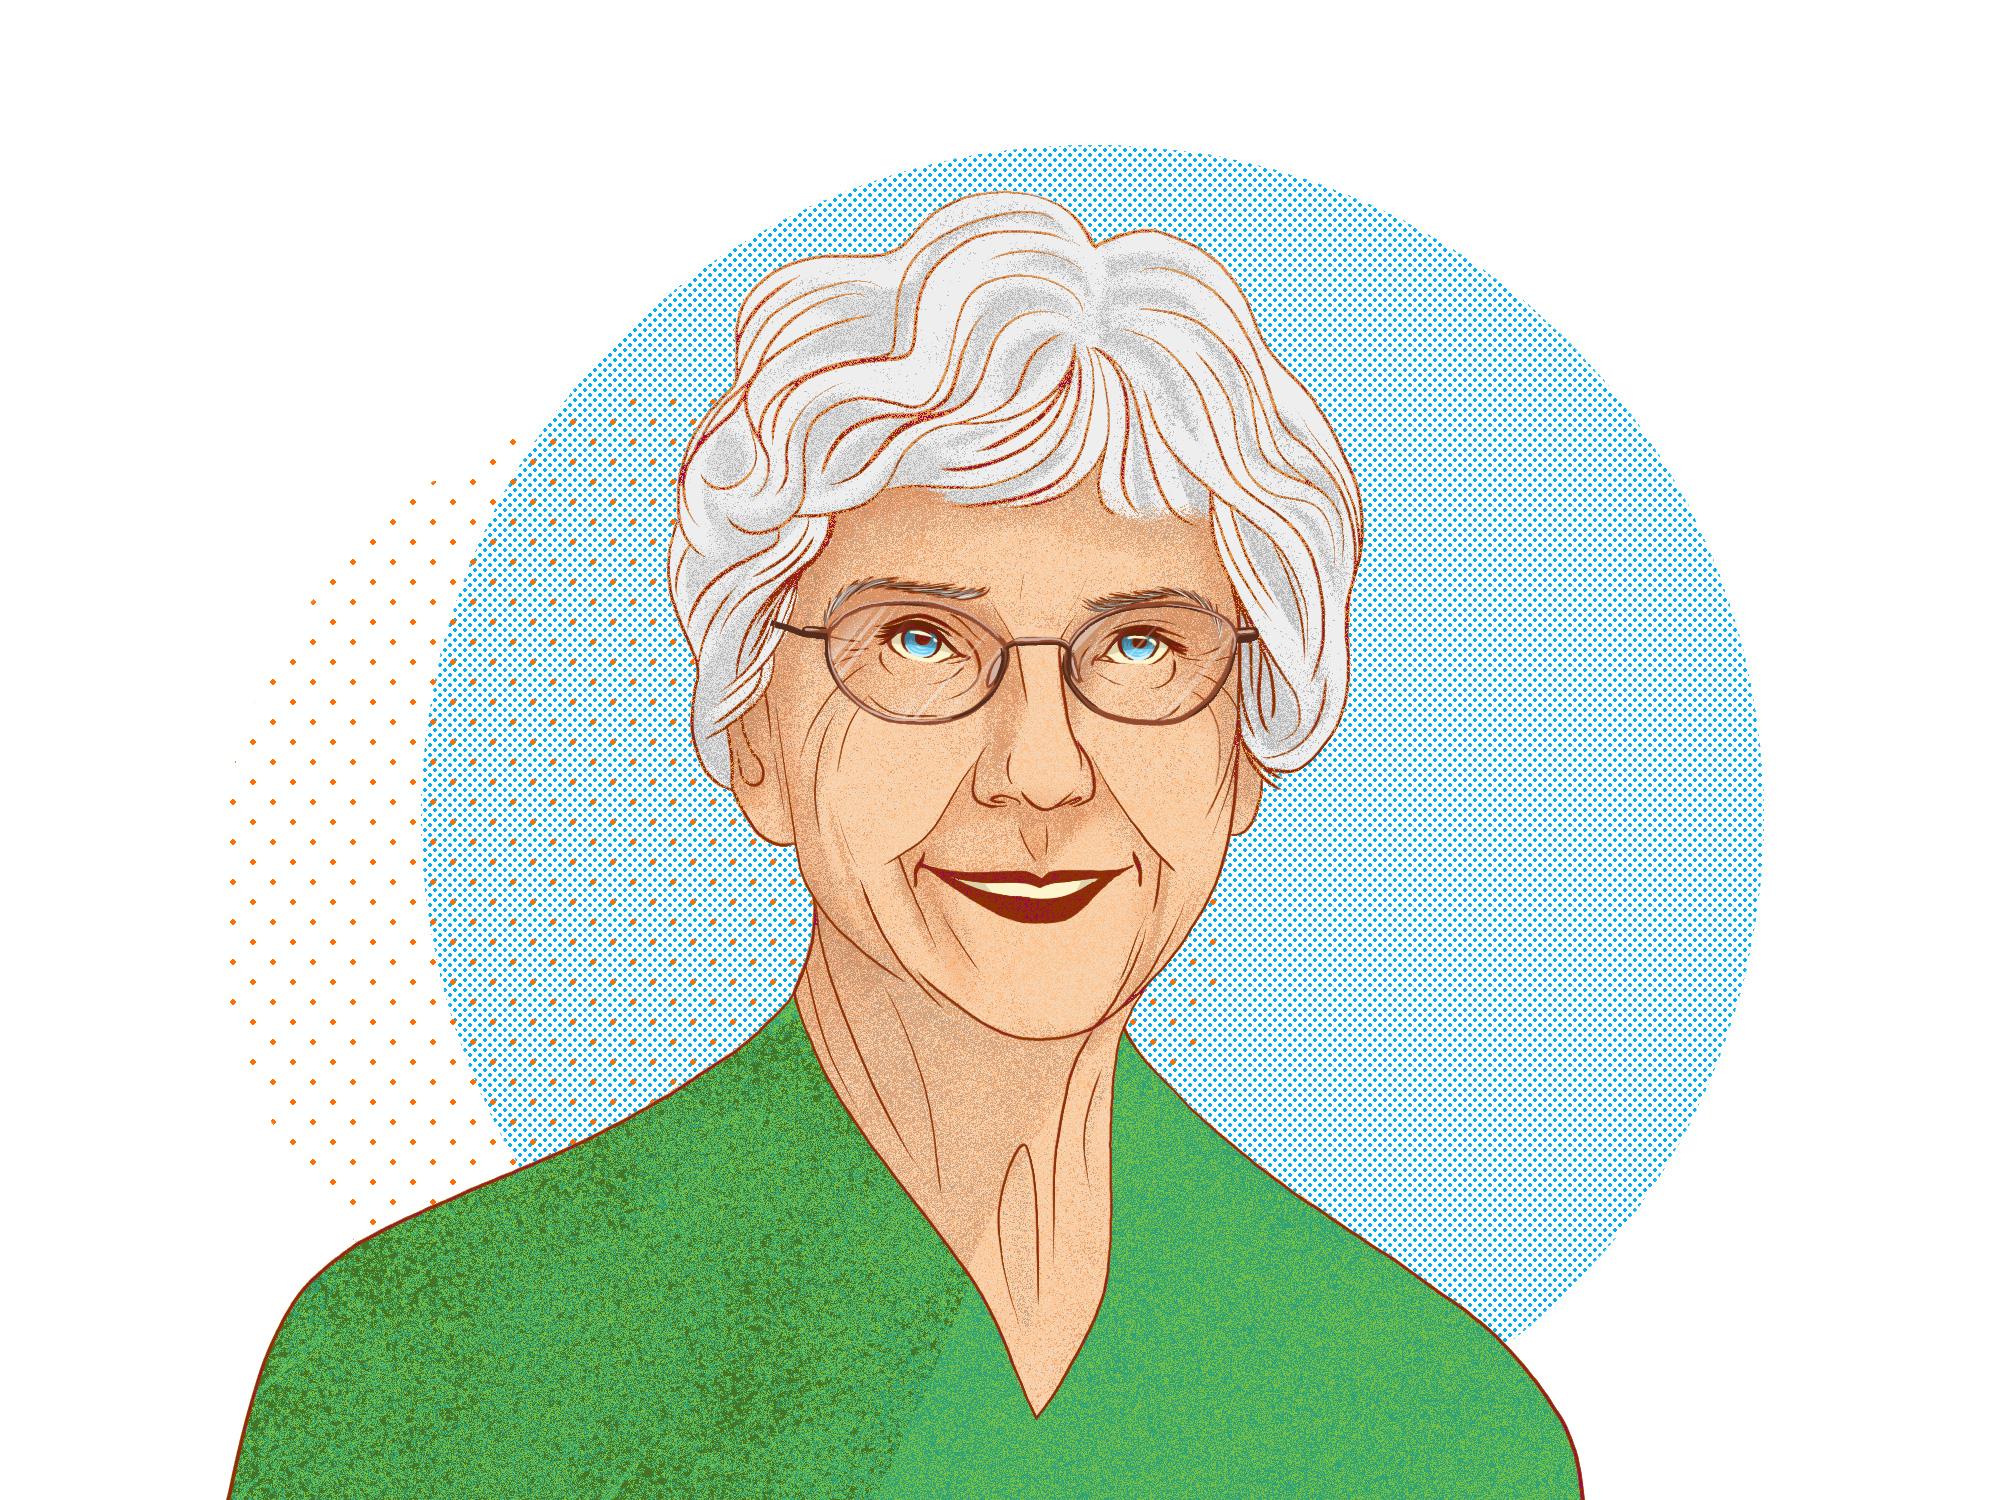 Margaret-Ann Armour, '70 PhD (Illustration by Jordan Carson)